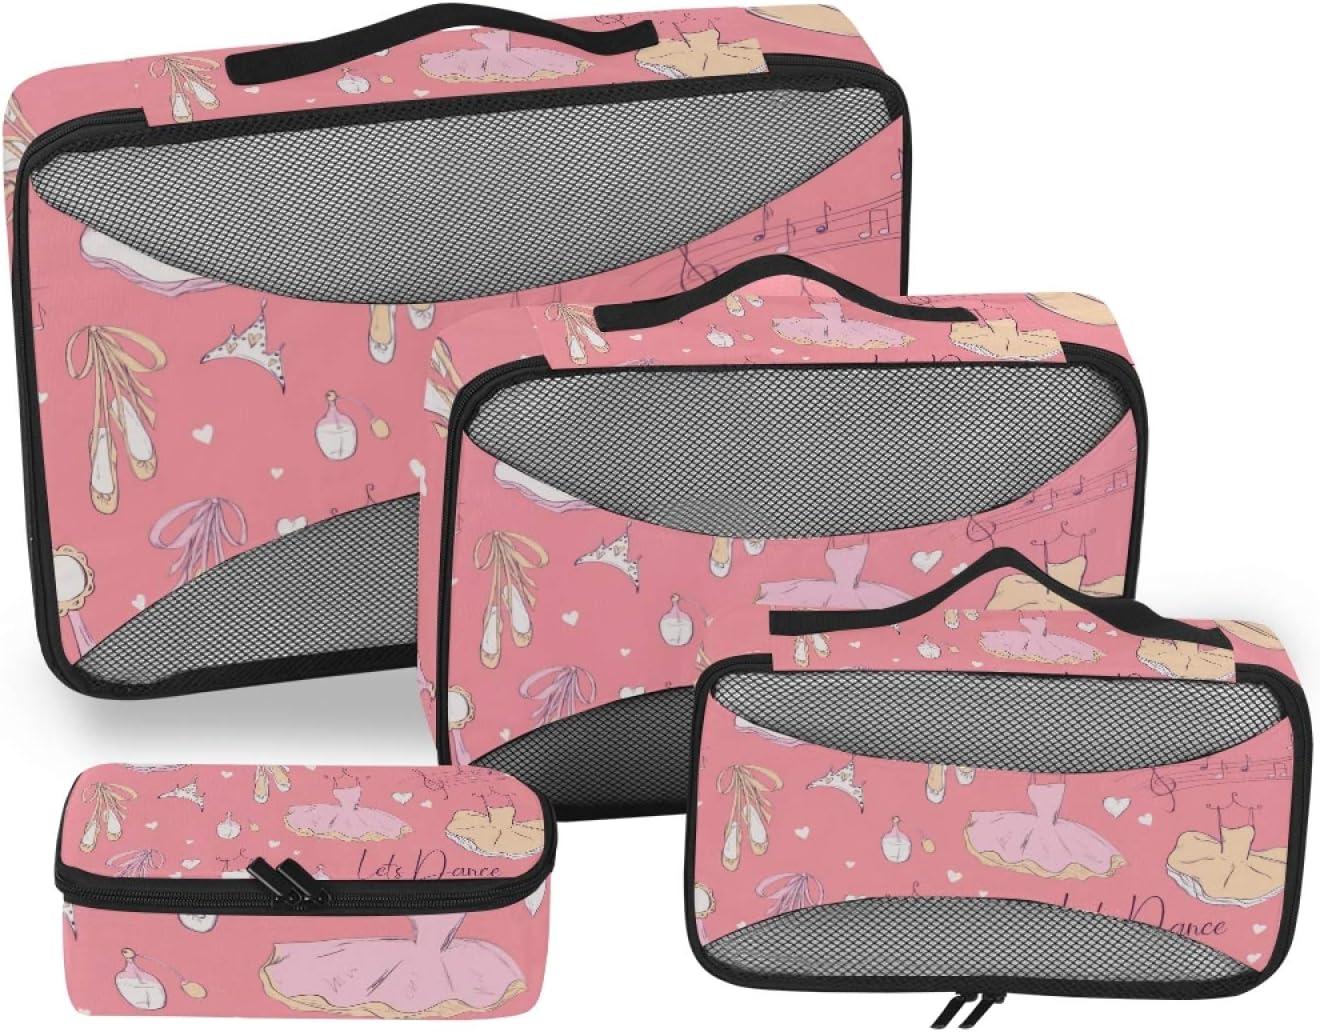 Ballerina Packing Cubes 4-Pcs Stora Ranking TOP14 Organizer Accessories Travel SALENEW very popular